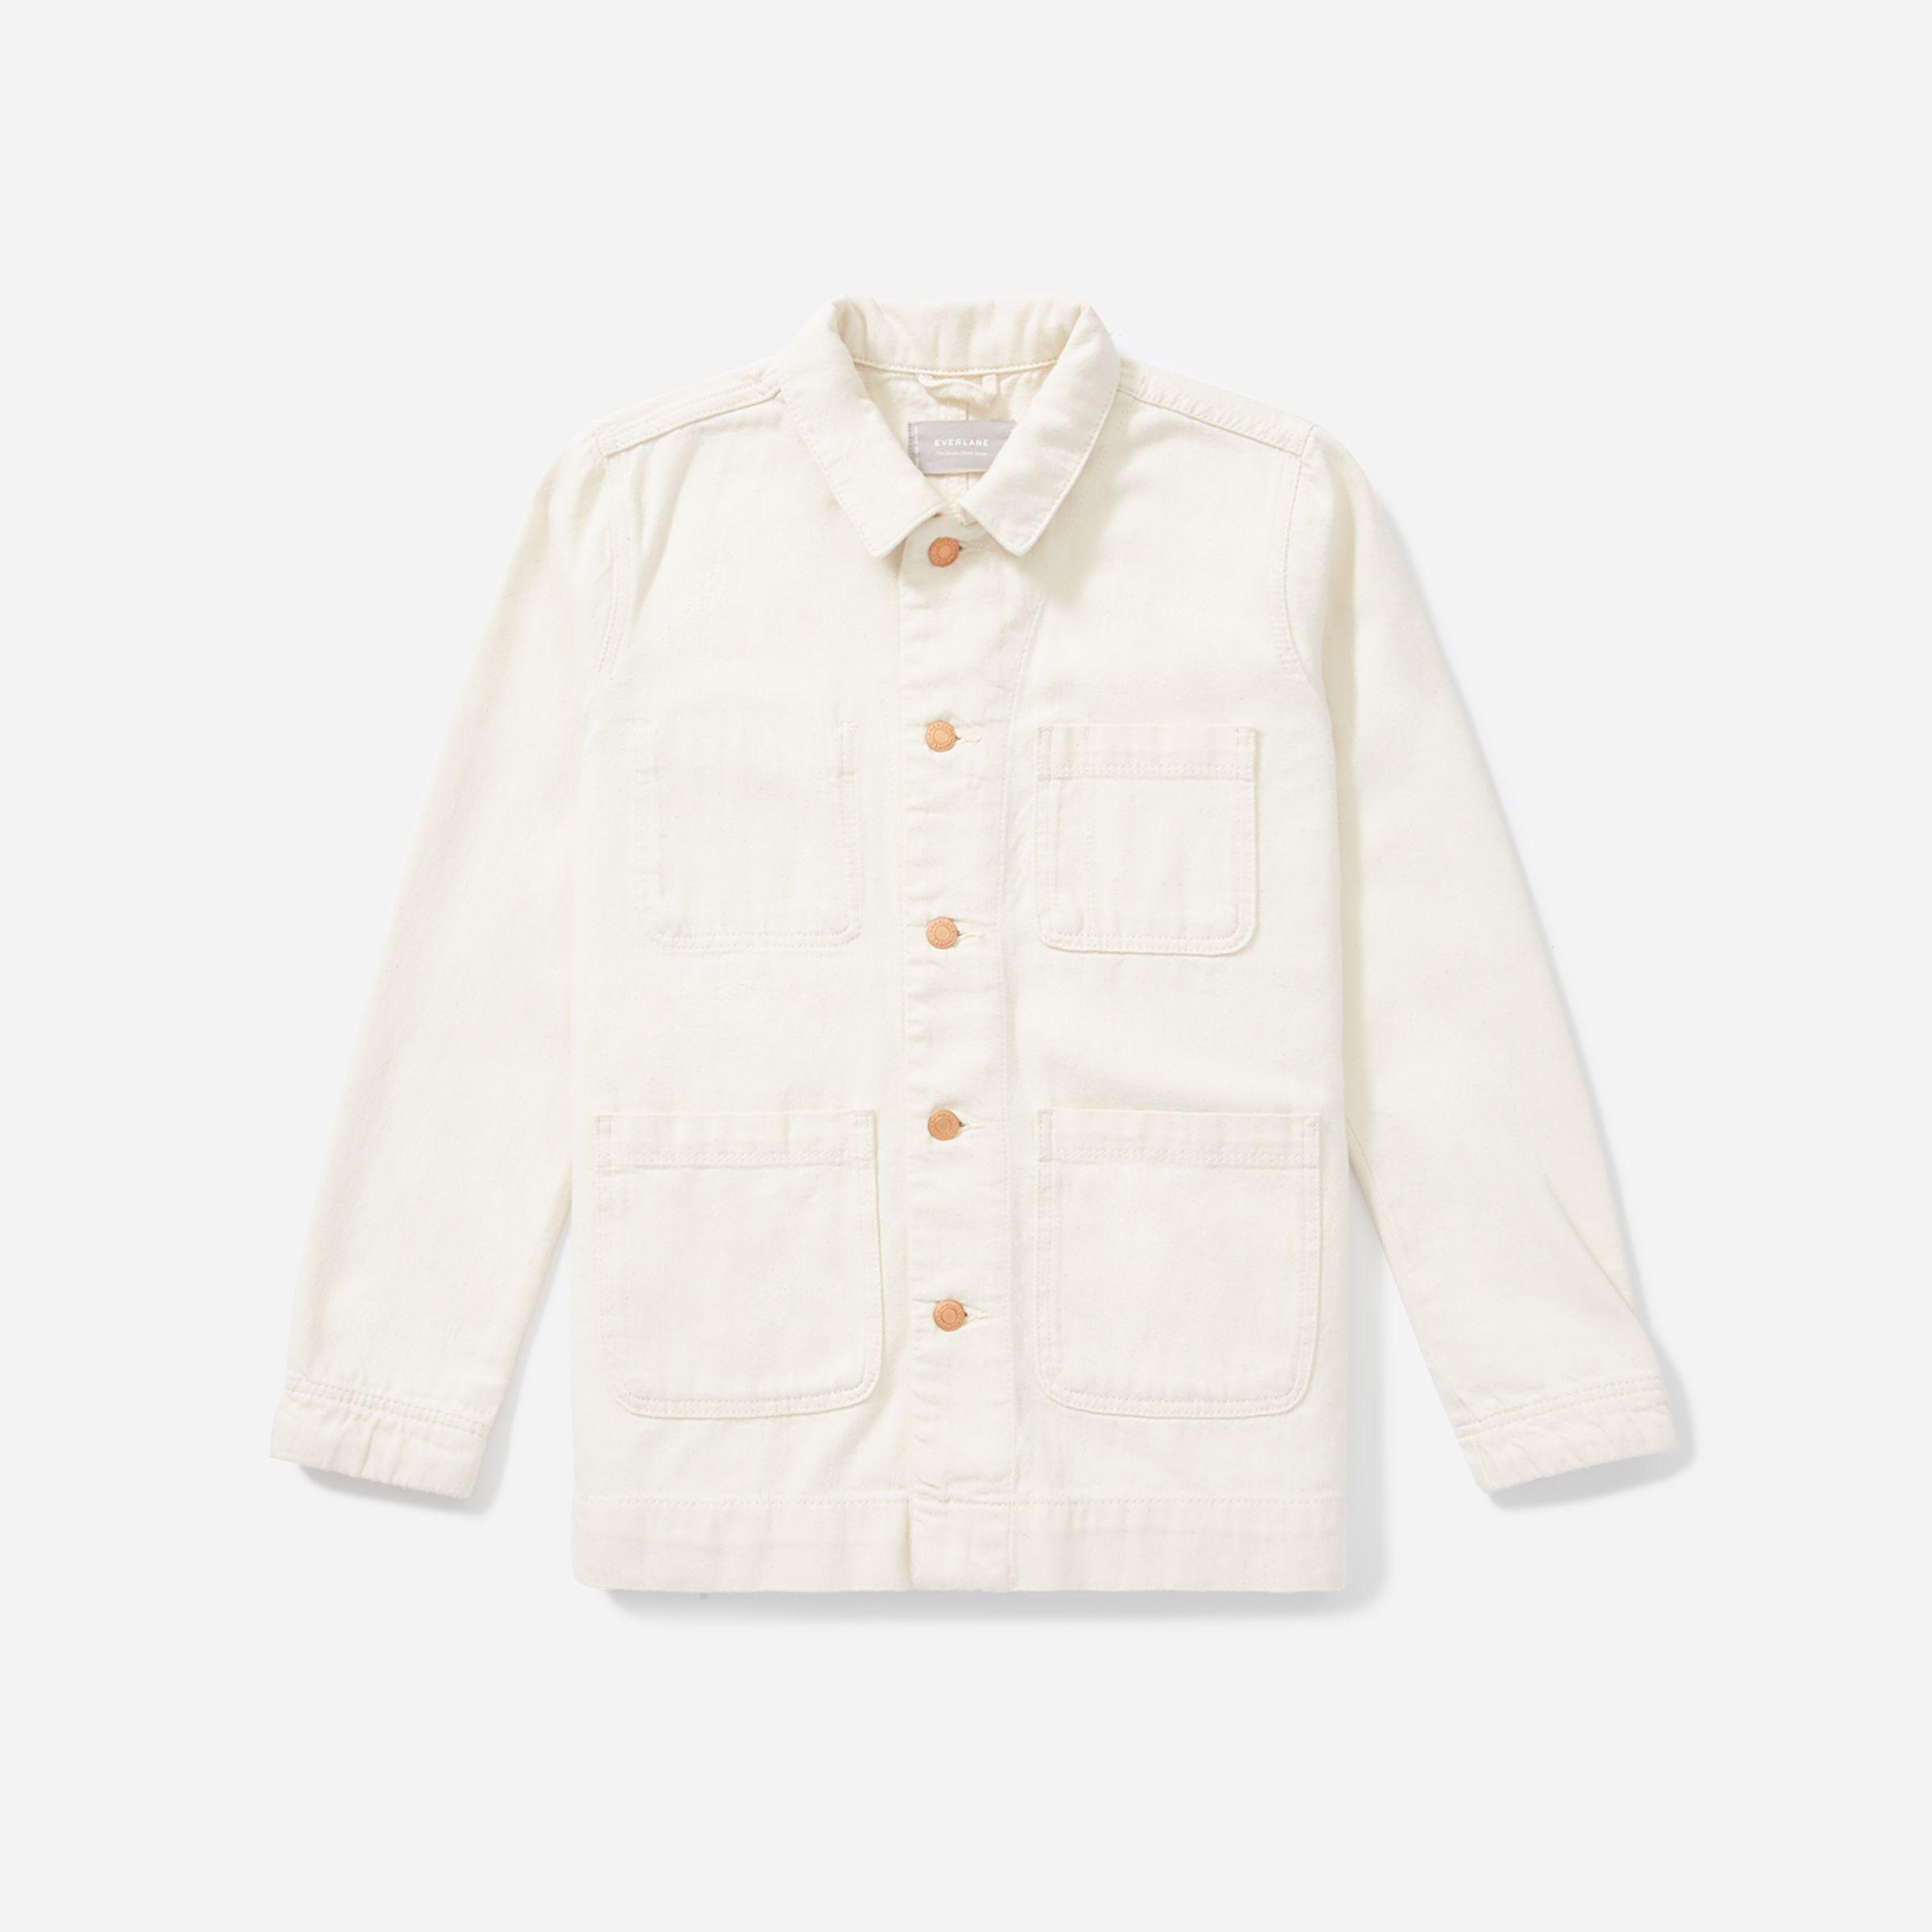 The Denim Chore Jacket